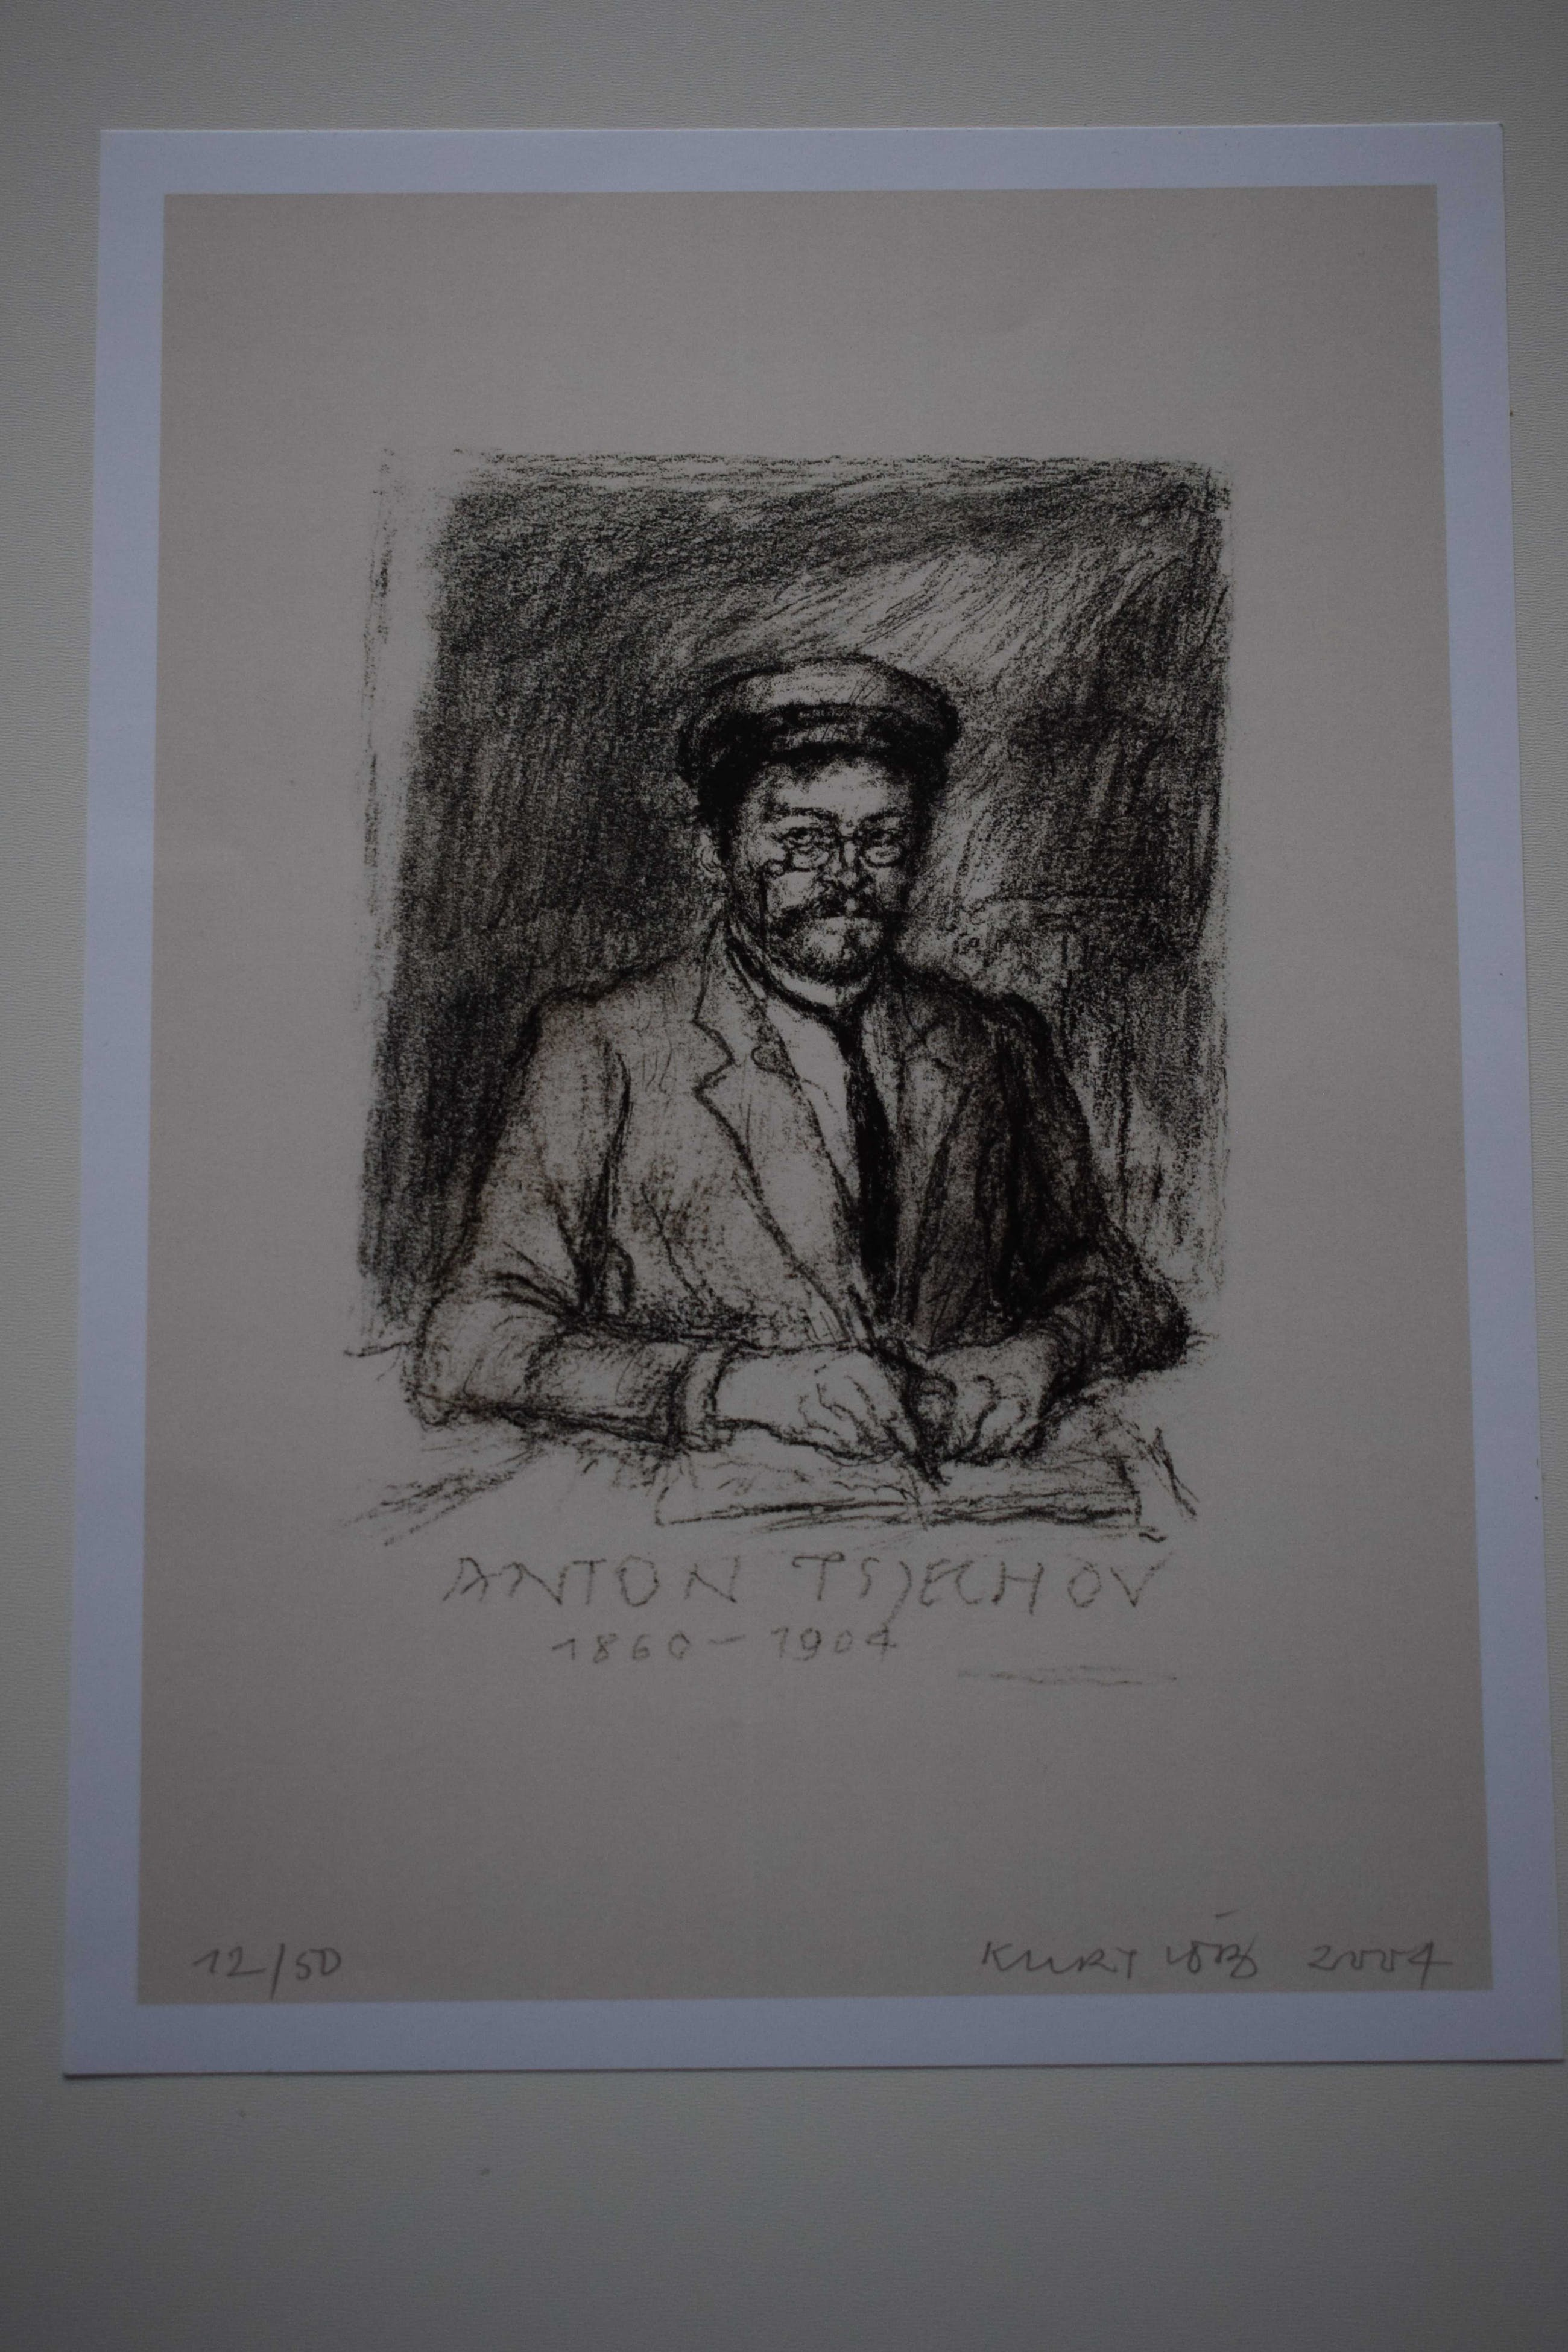 Kurt Lob - Anton Tsjechov 1860-1904 kopen? Bied vanaf 50!